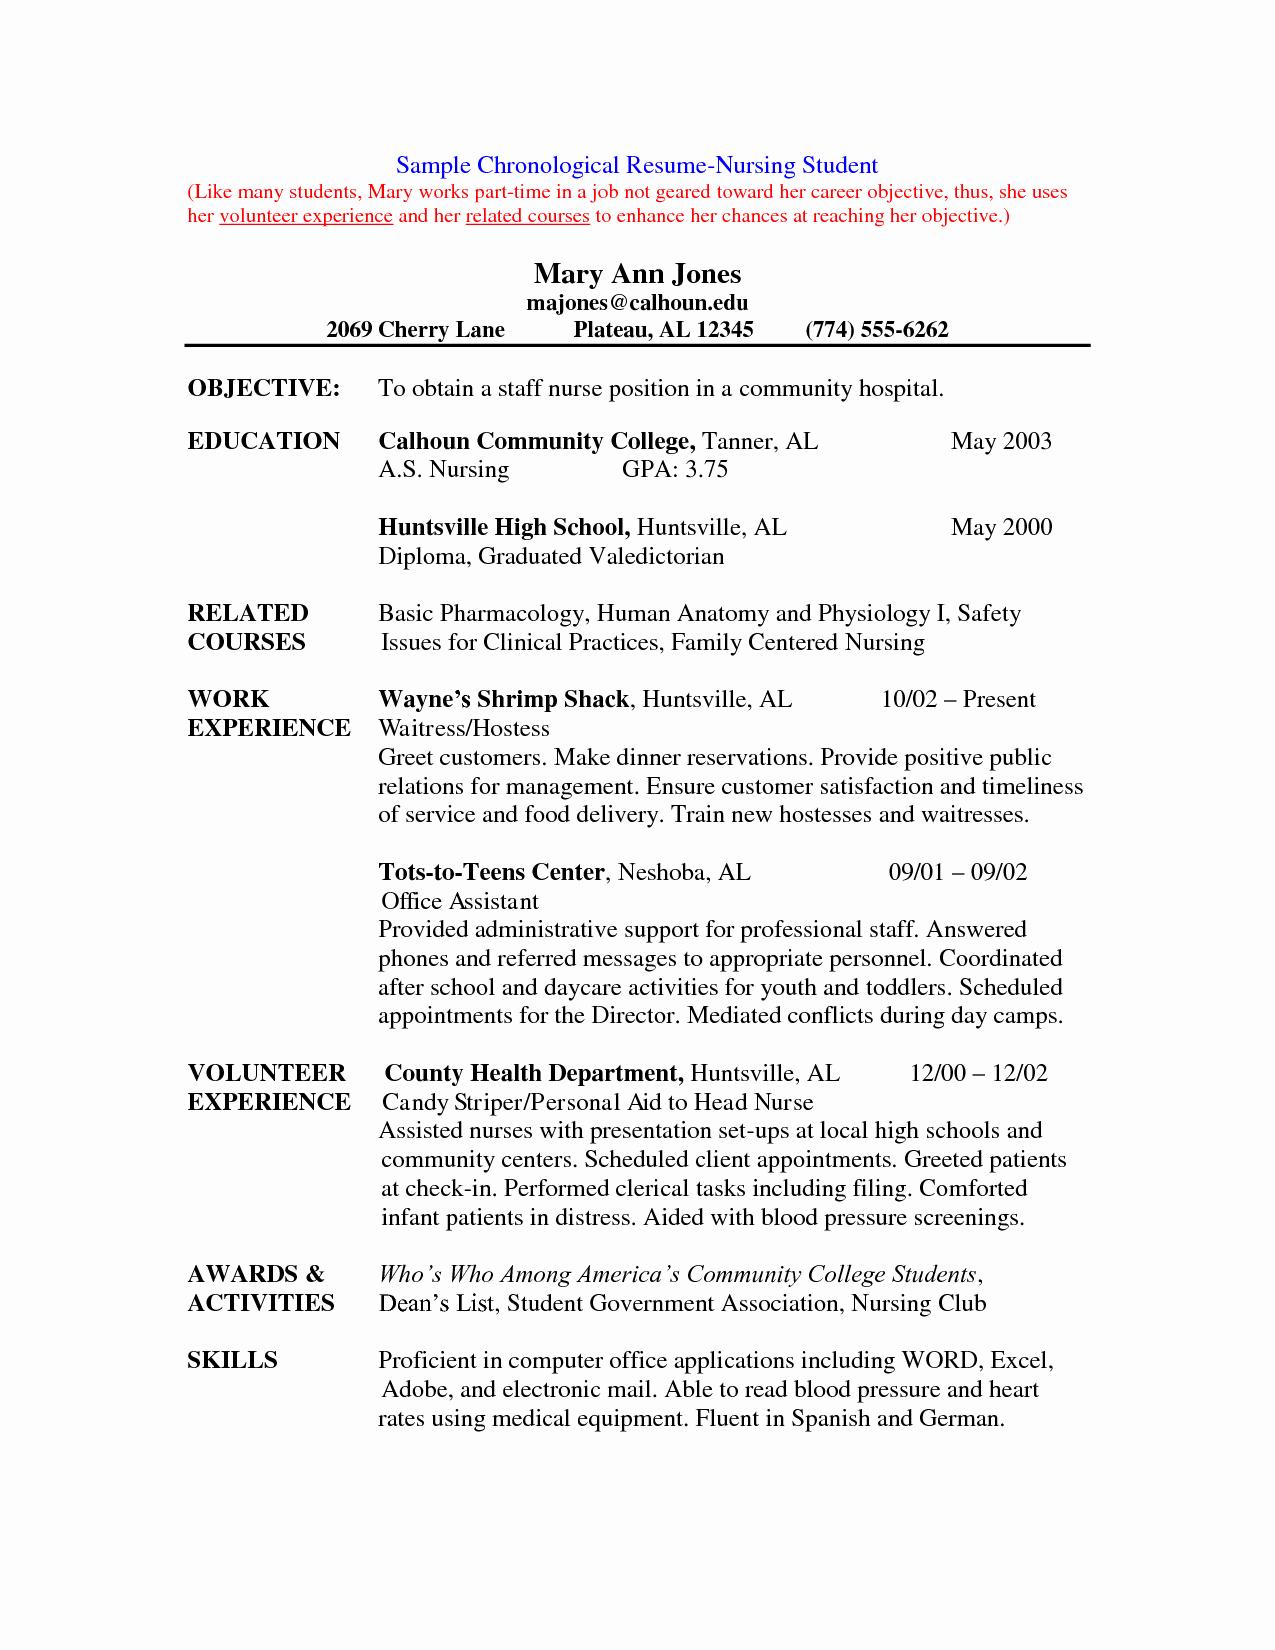 Resume for Nursing Student Beautiful Cover Letters for Nursing Job Application Pdf Nursing Pinterest